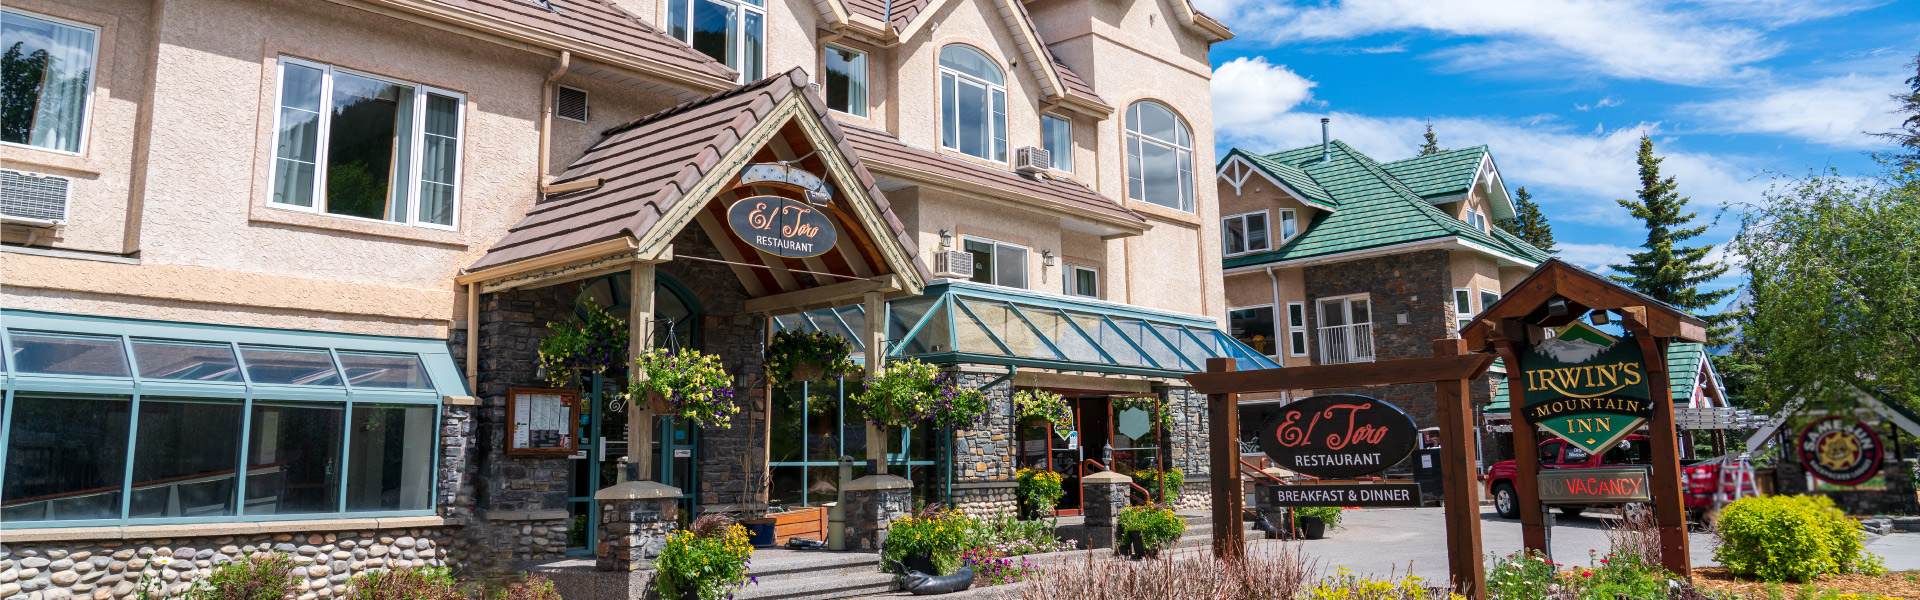 Contact us Irwin's Mountain Inn